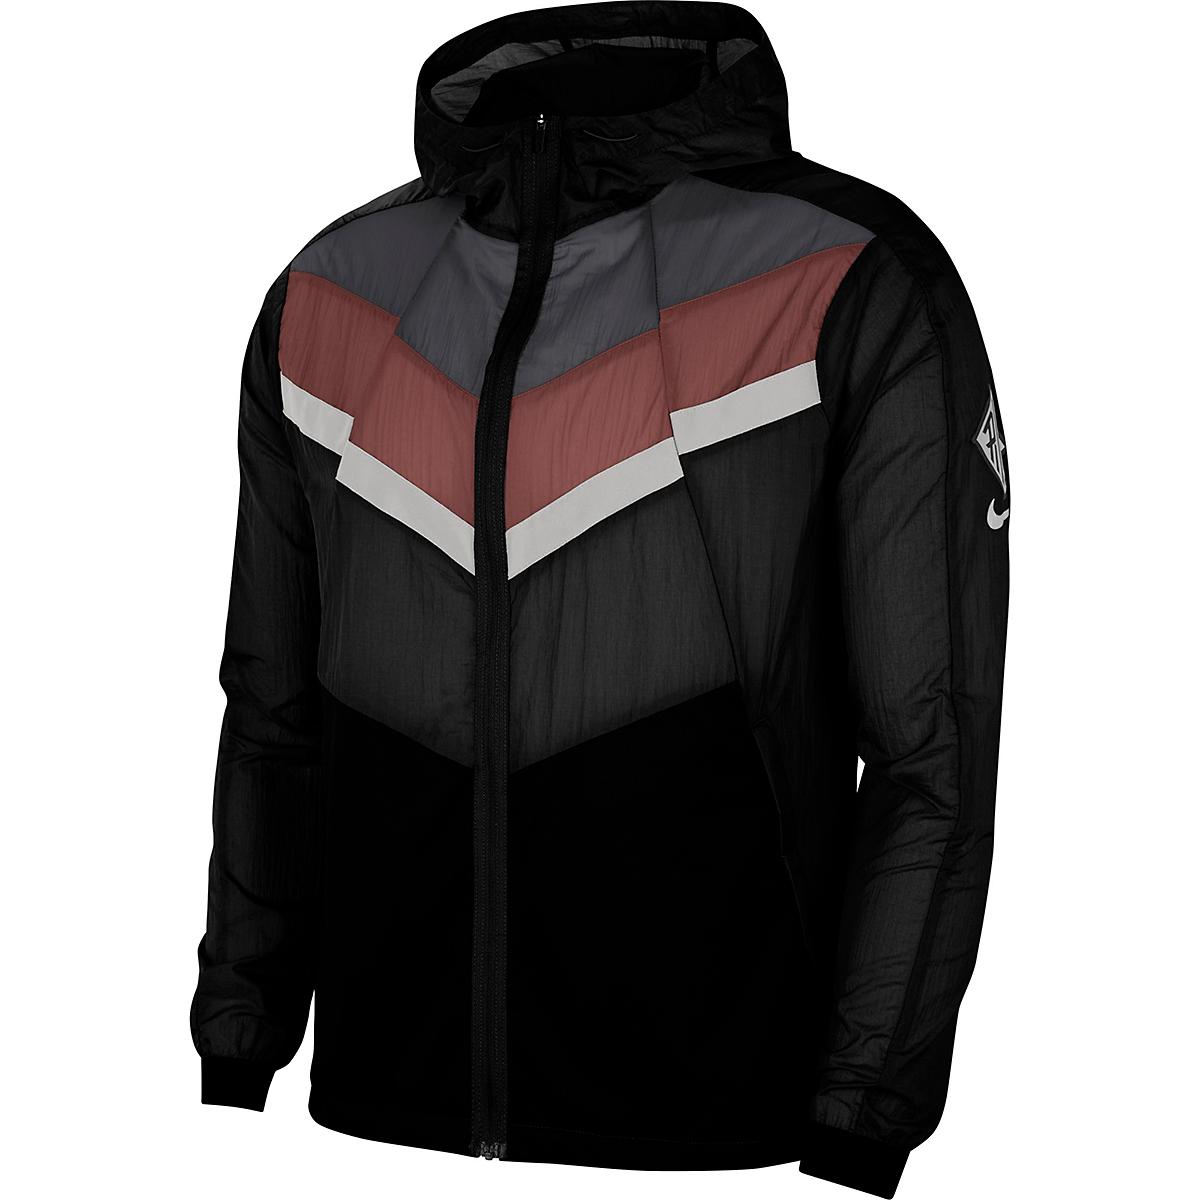 Men's Nike Windrunner Wild Run Running Jacket - Color: Black/Dark Smoke Grey/Claystone Red - Size: S, Black/Dark Smoke Grey/Claystone Red, large, image 3